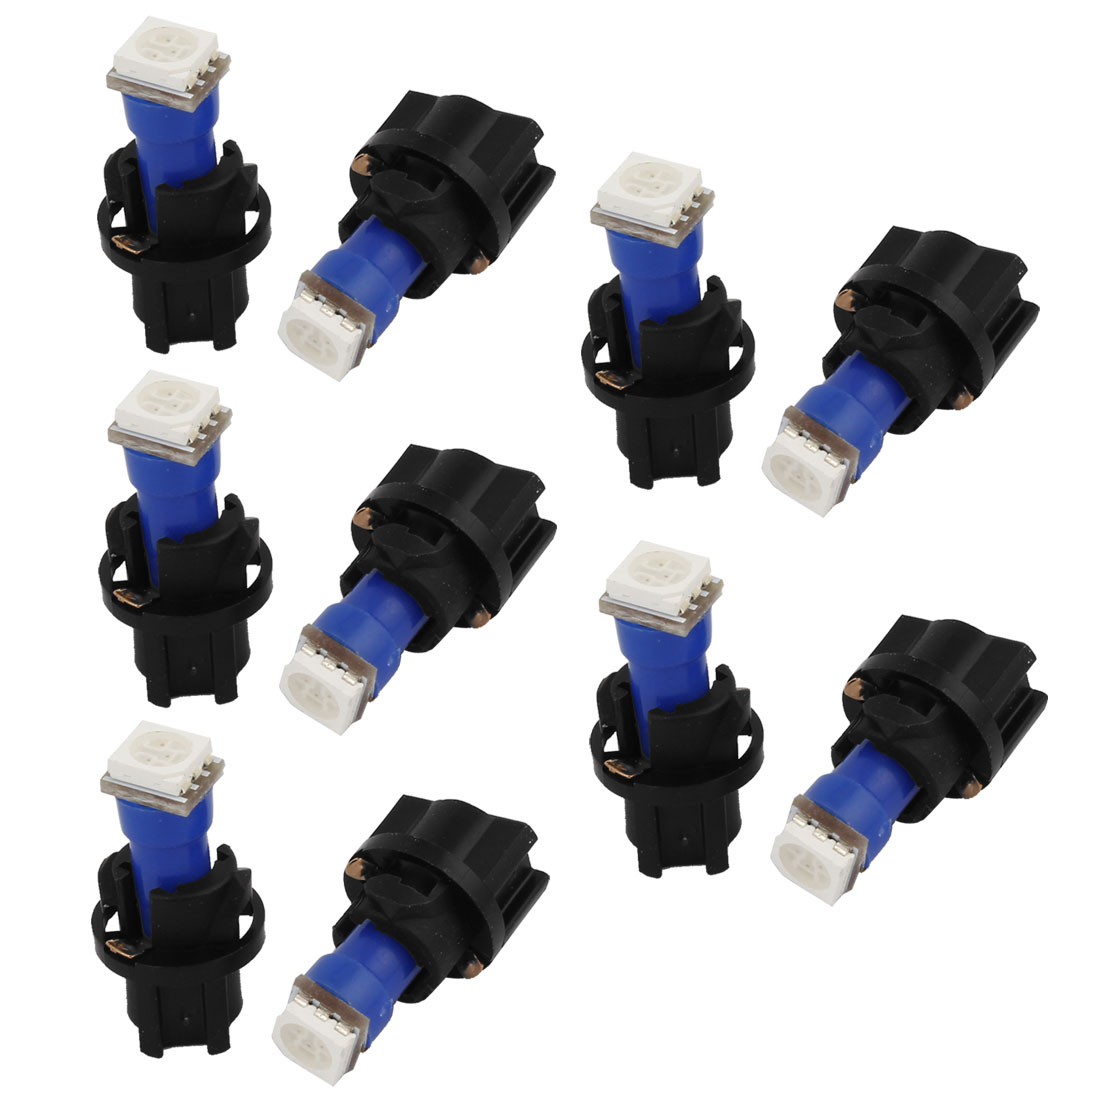 Unique Bargains 10pcs T5 5050 SMD PC74 Blue LED Car Side Lights Dashboard Lamps Bulbs Interior